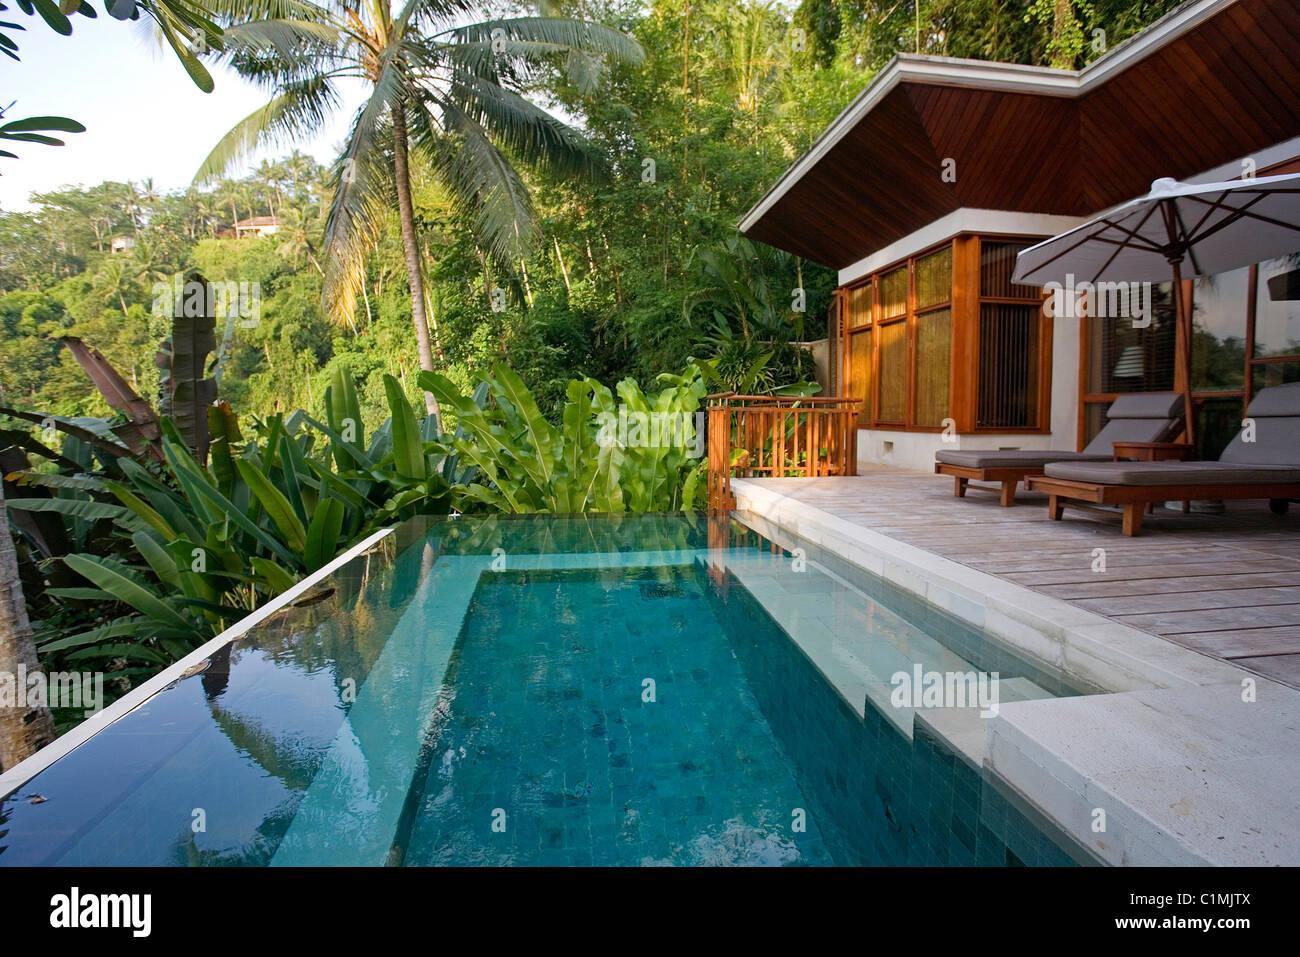 Indonesia Bali Luxury Hotel Four Seasons In Sayan Near Ubud Stock Photo Alamy